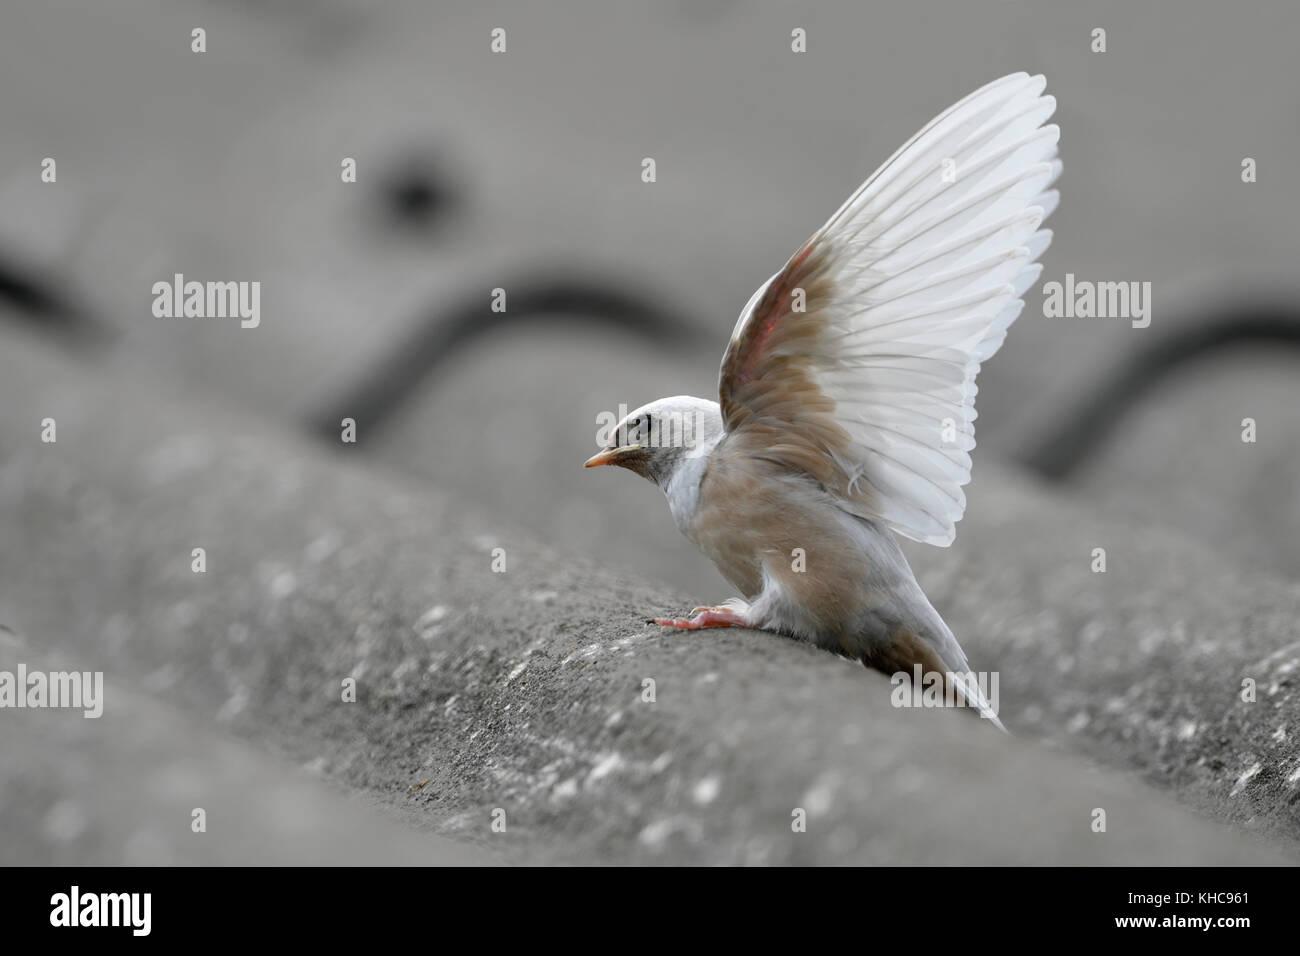 Barn Swallow ( Hirundo rustica ), fledged, rare gene defect, white plumage, leucistic, leucism, perched on a roof, - Stock Image